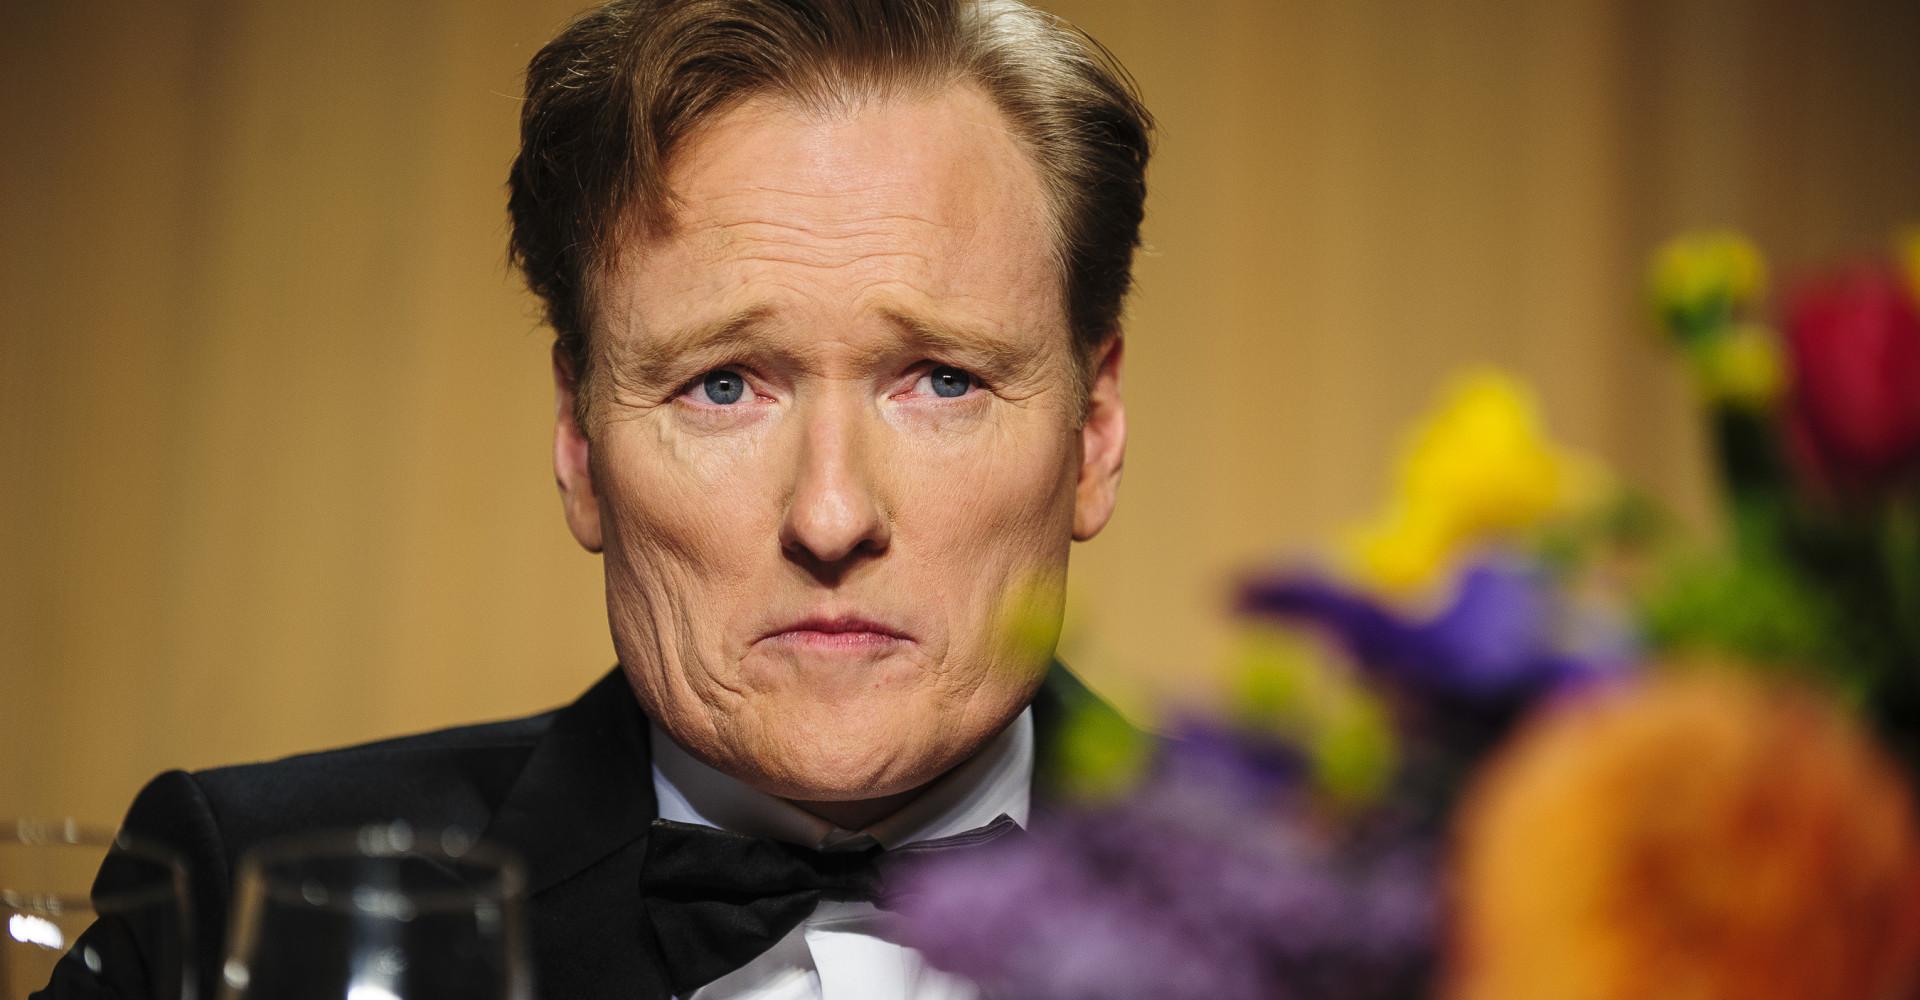 Conan O'Brien navigates the world of late-night entertainment